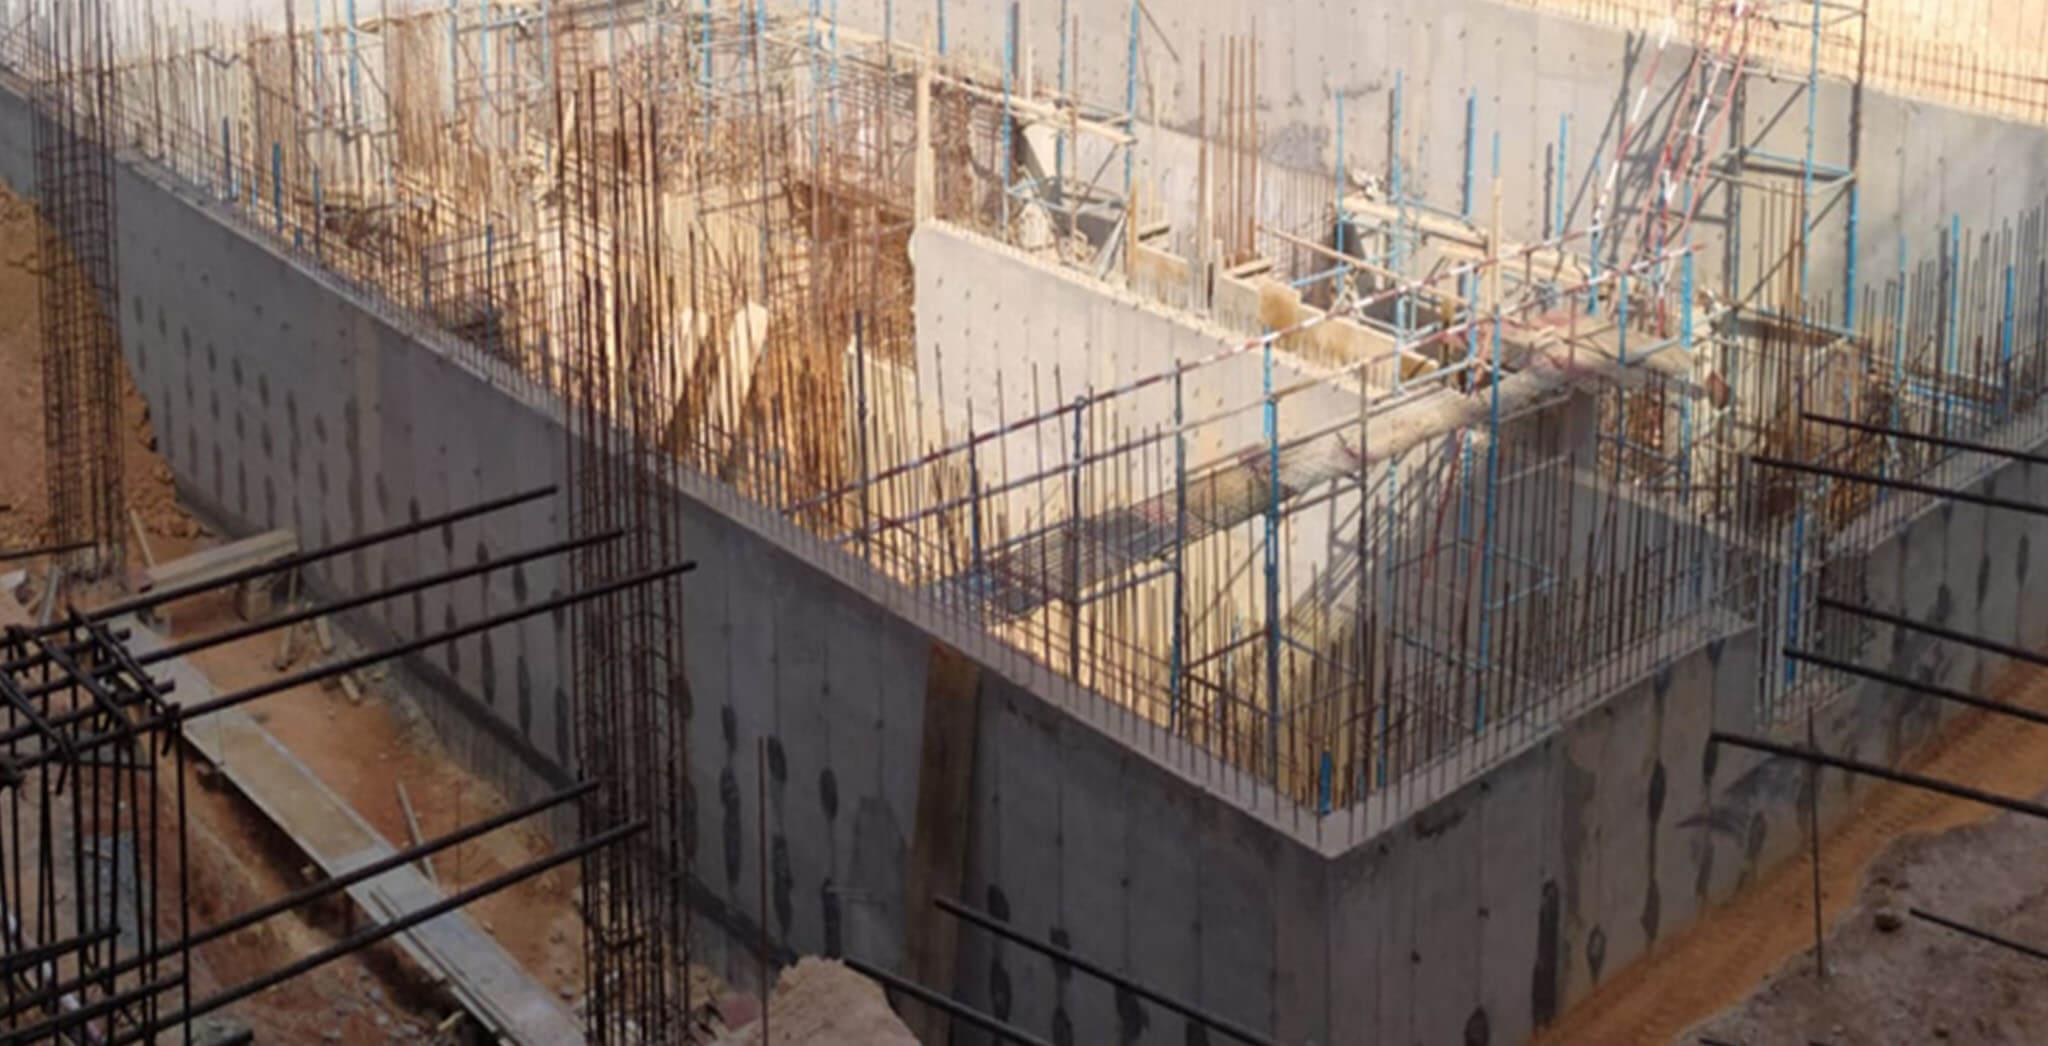 Jun 2021 - Helio Block: Sewage treatment plant